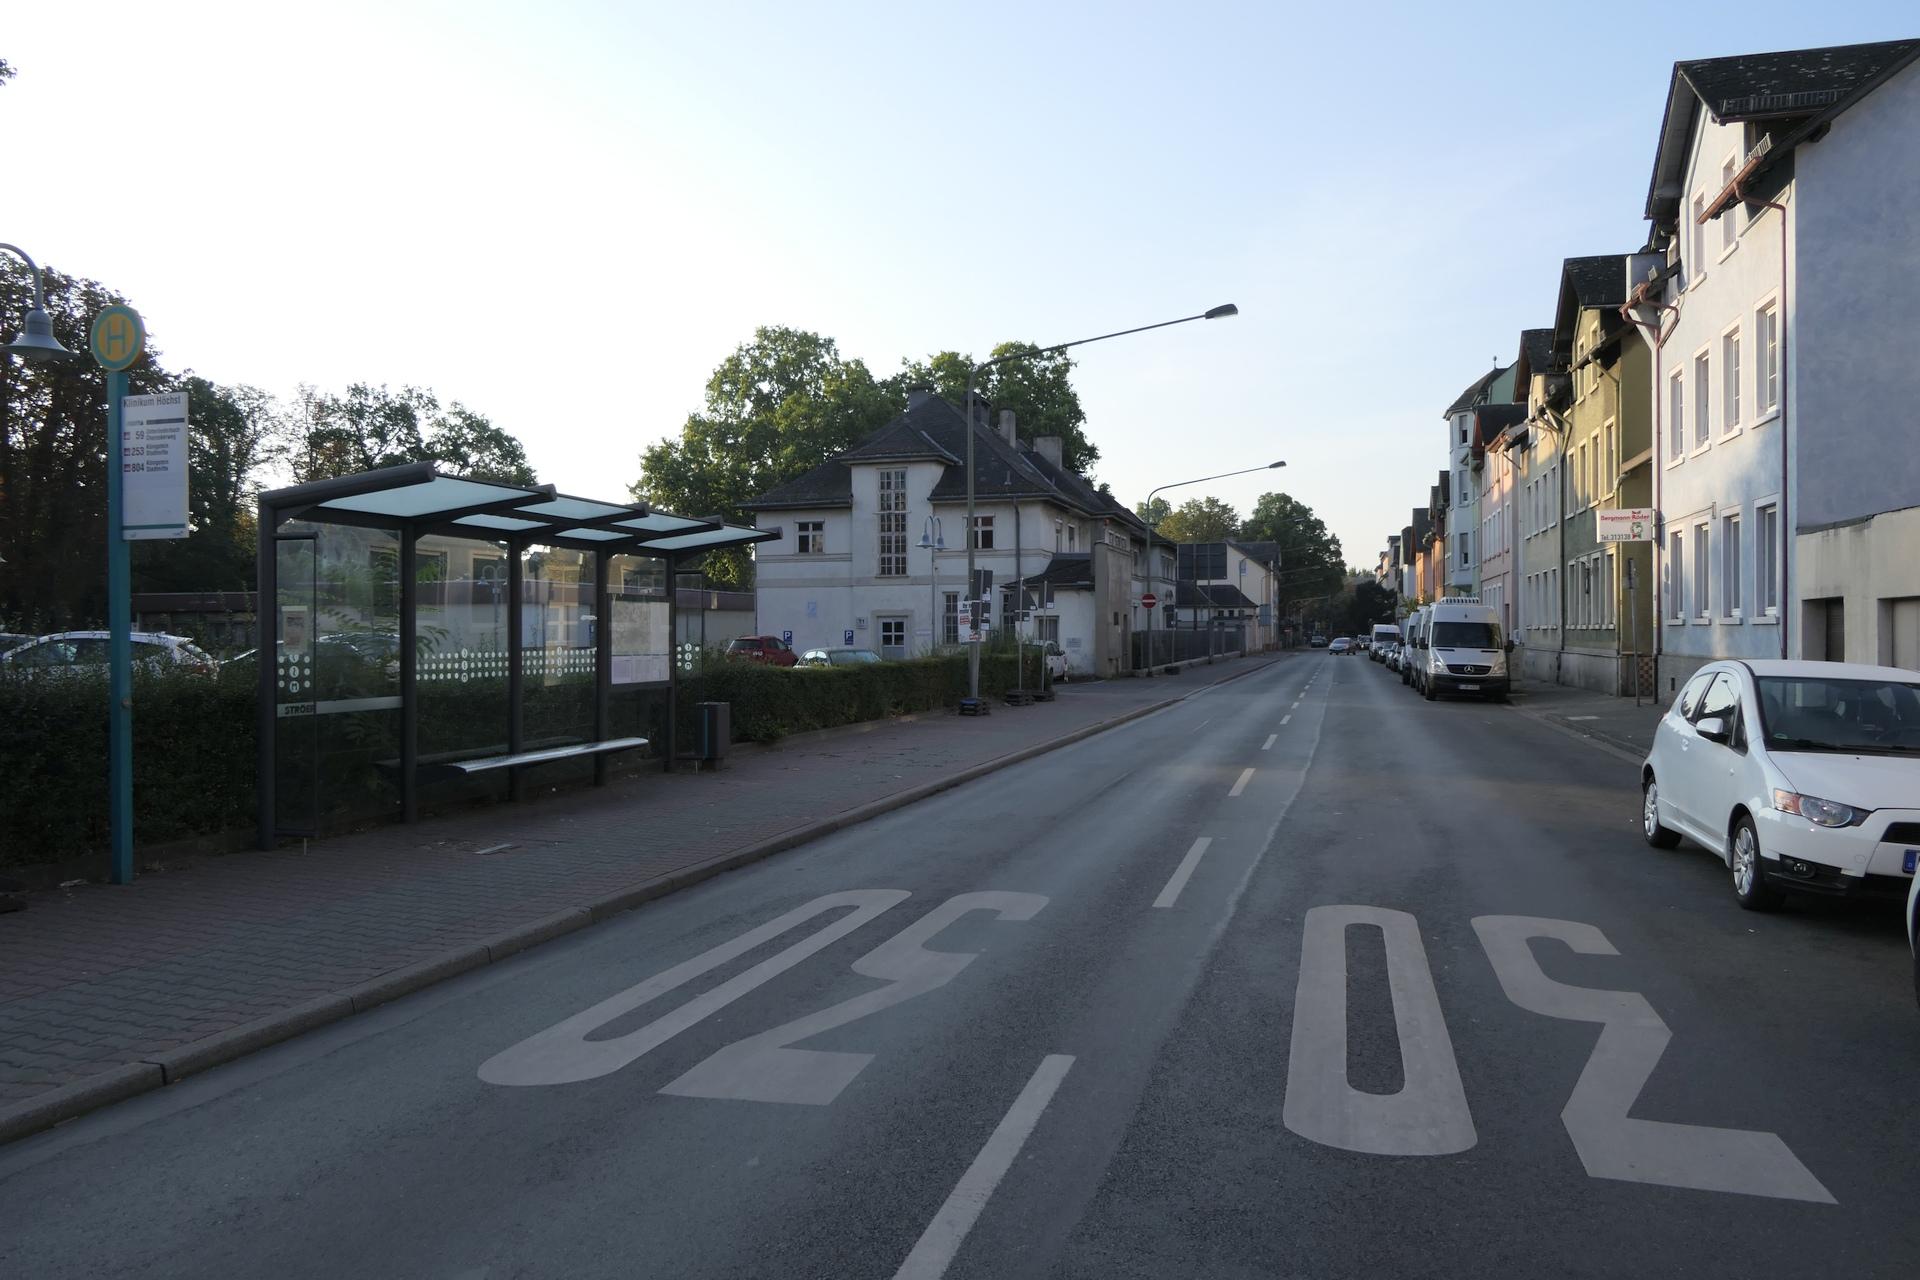 Wetter Zeilsheim